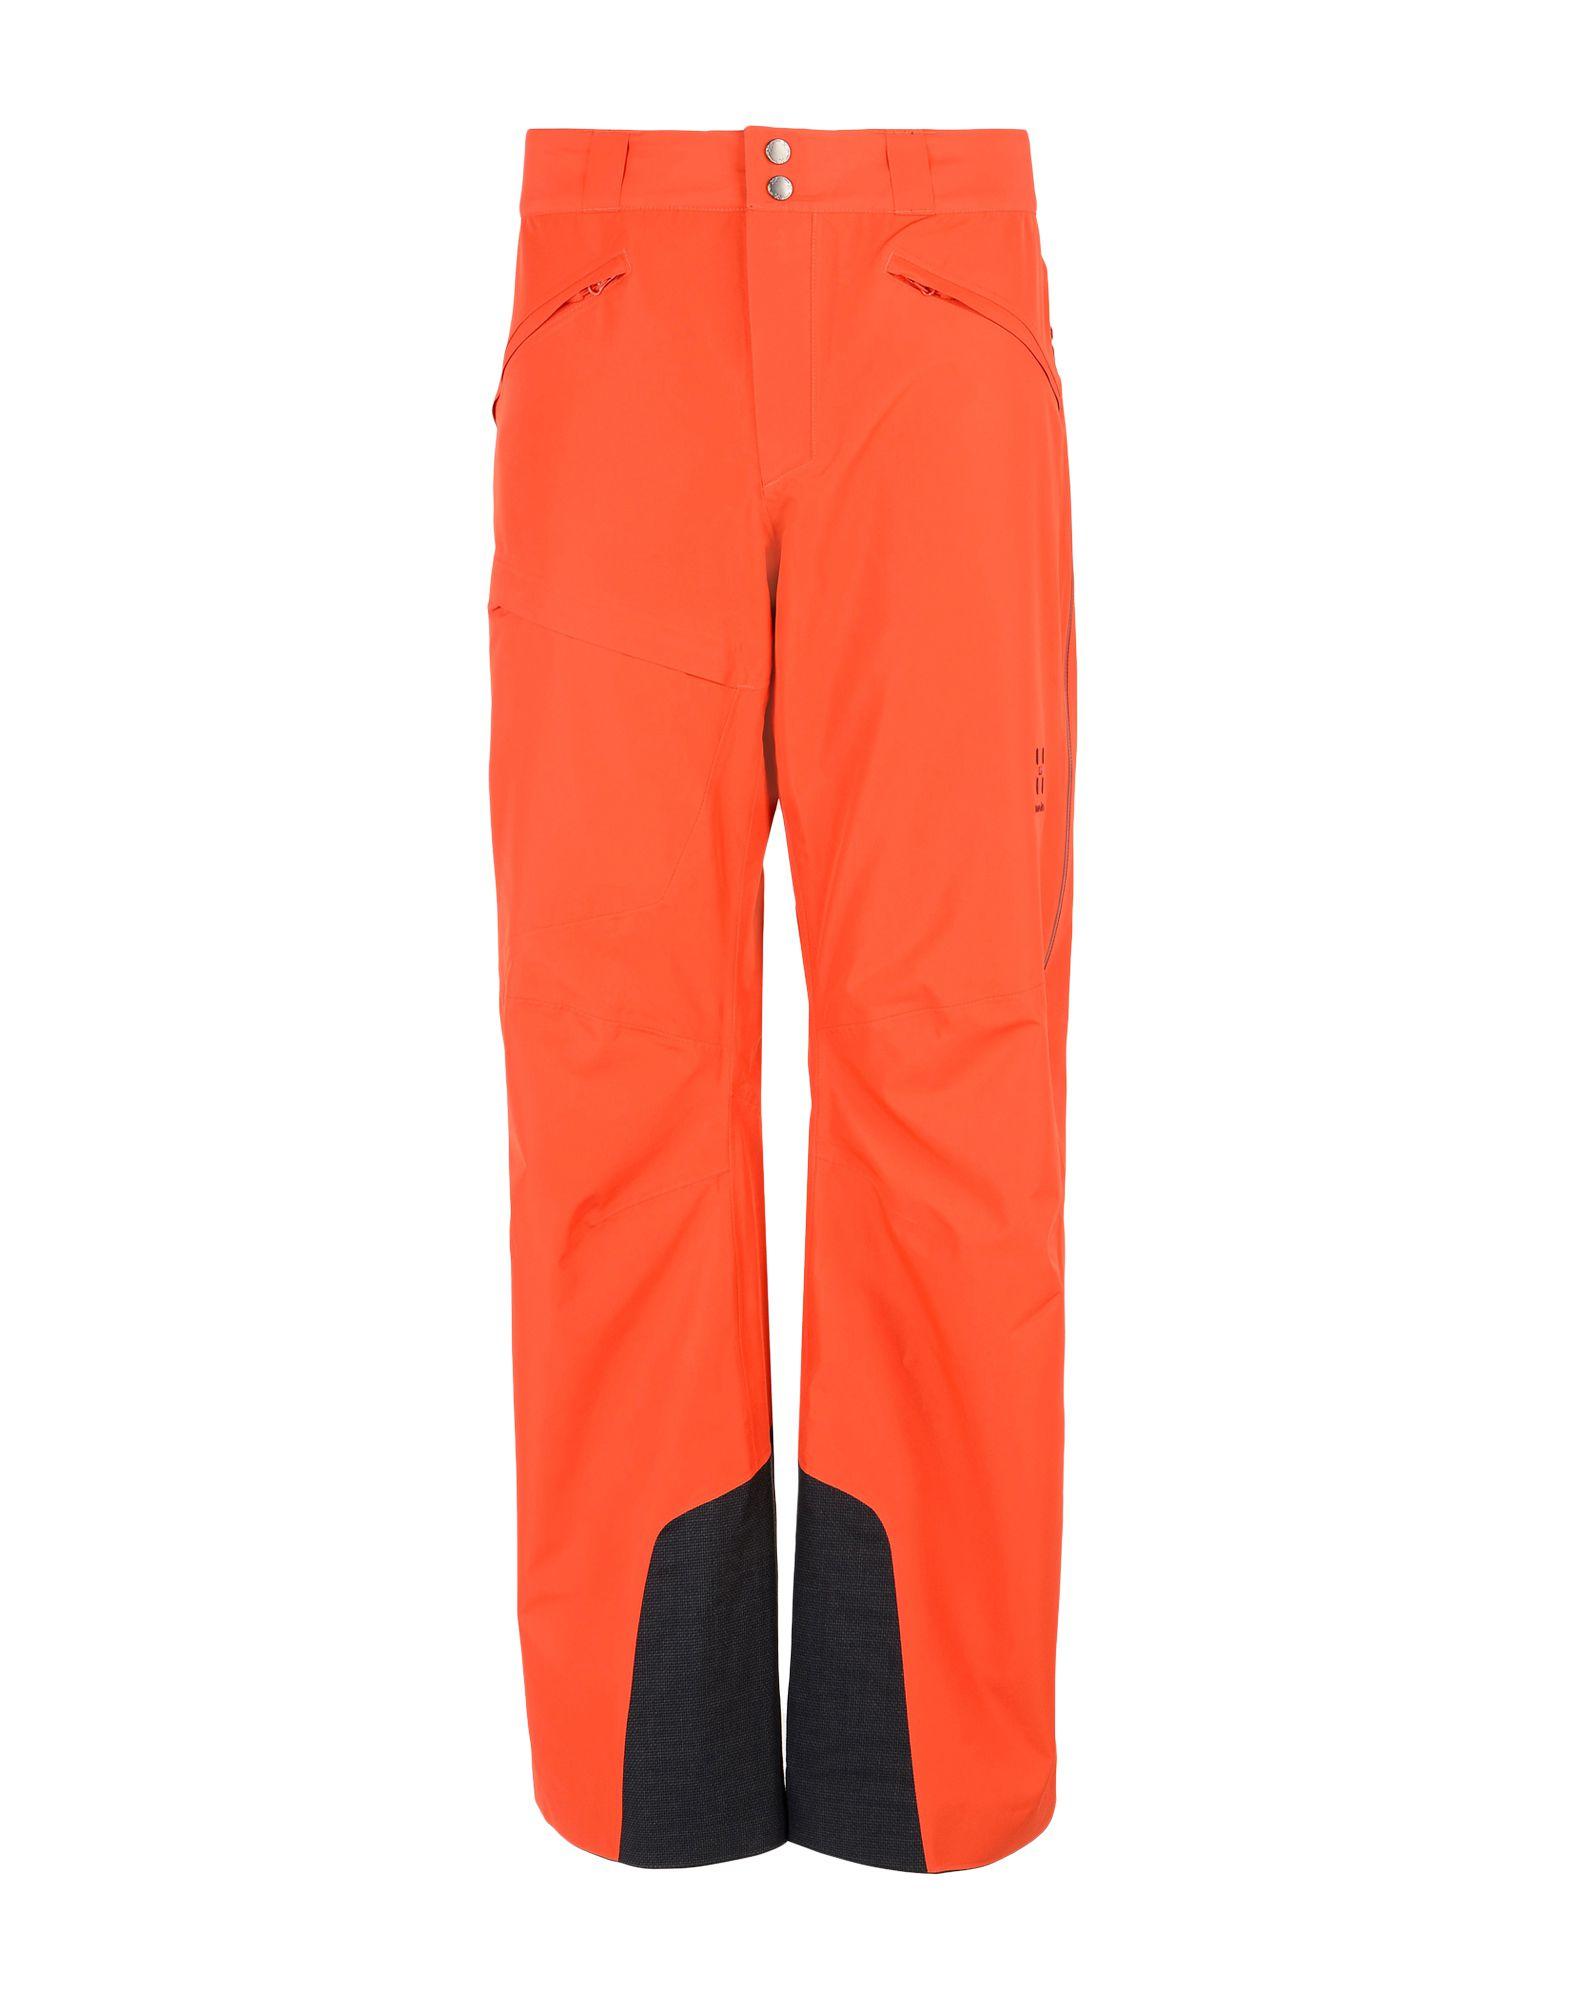 Pantalone Sportivo Haglöfs Line Pant Men - Uomo - Acquista online su